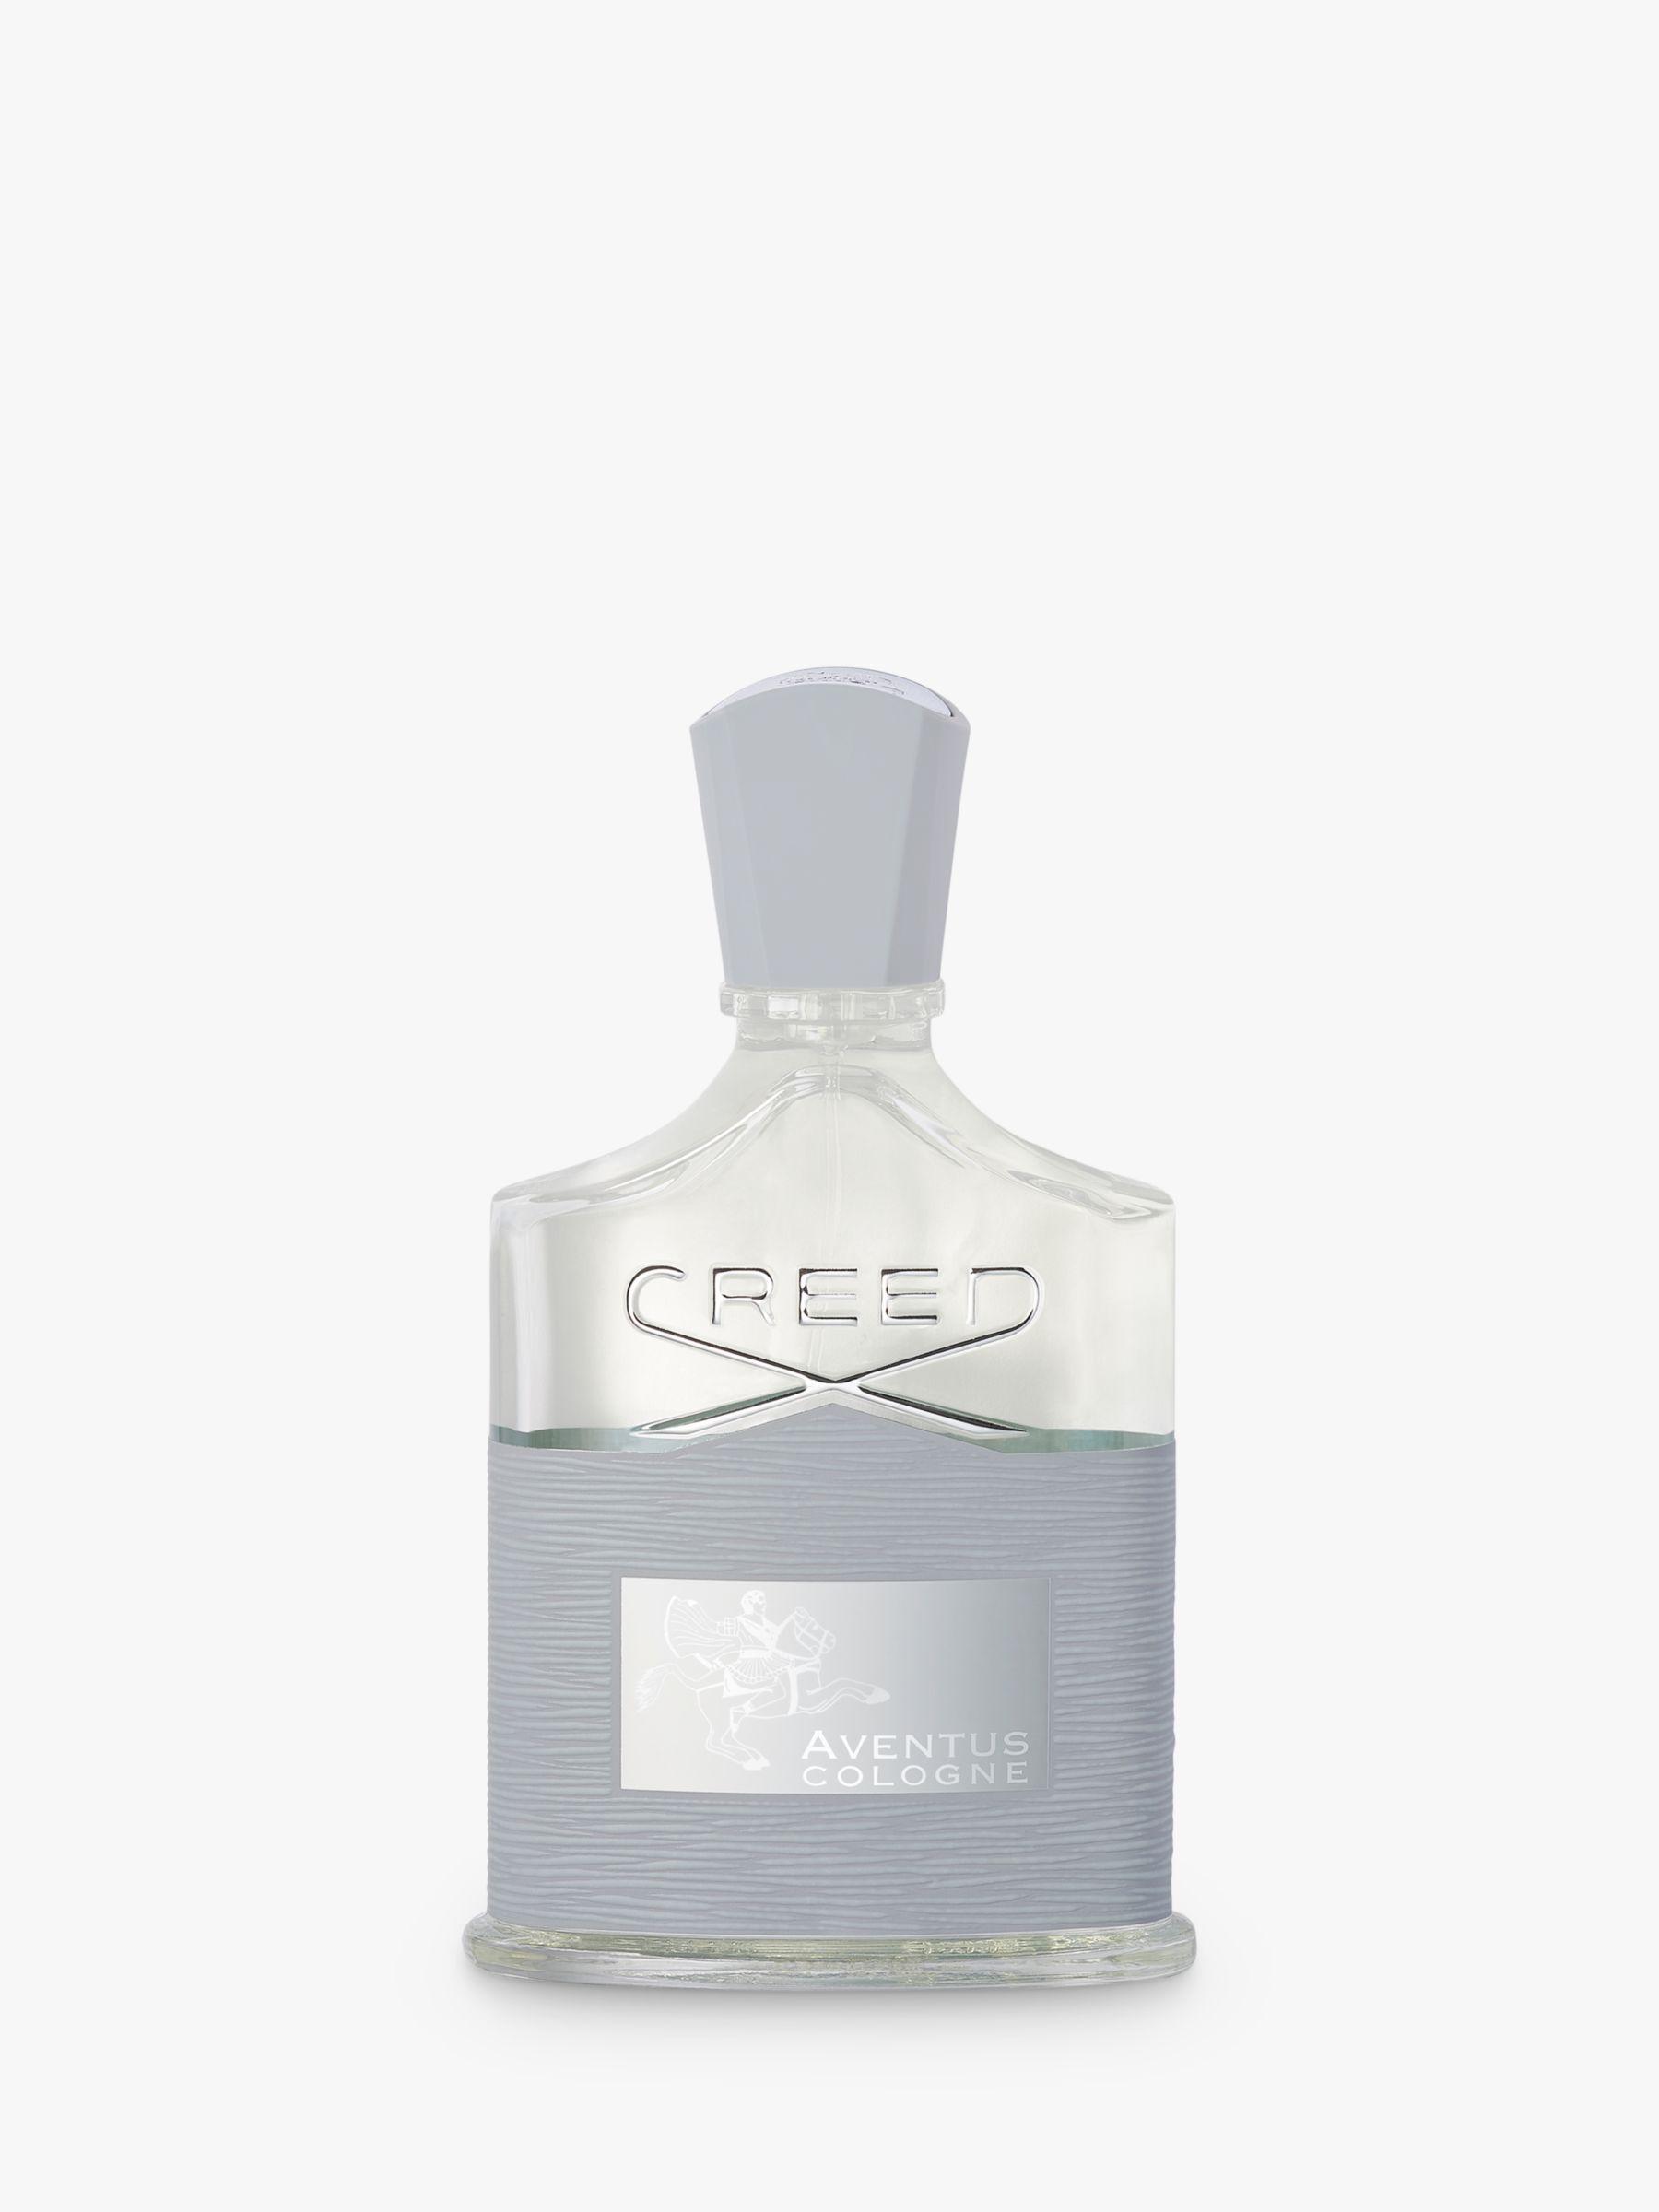 Creed CREED Aventus Cologne Eau de Parfum, 50ml